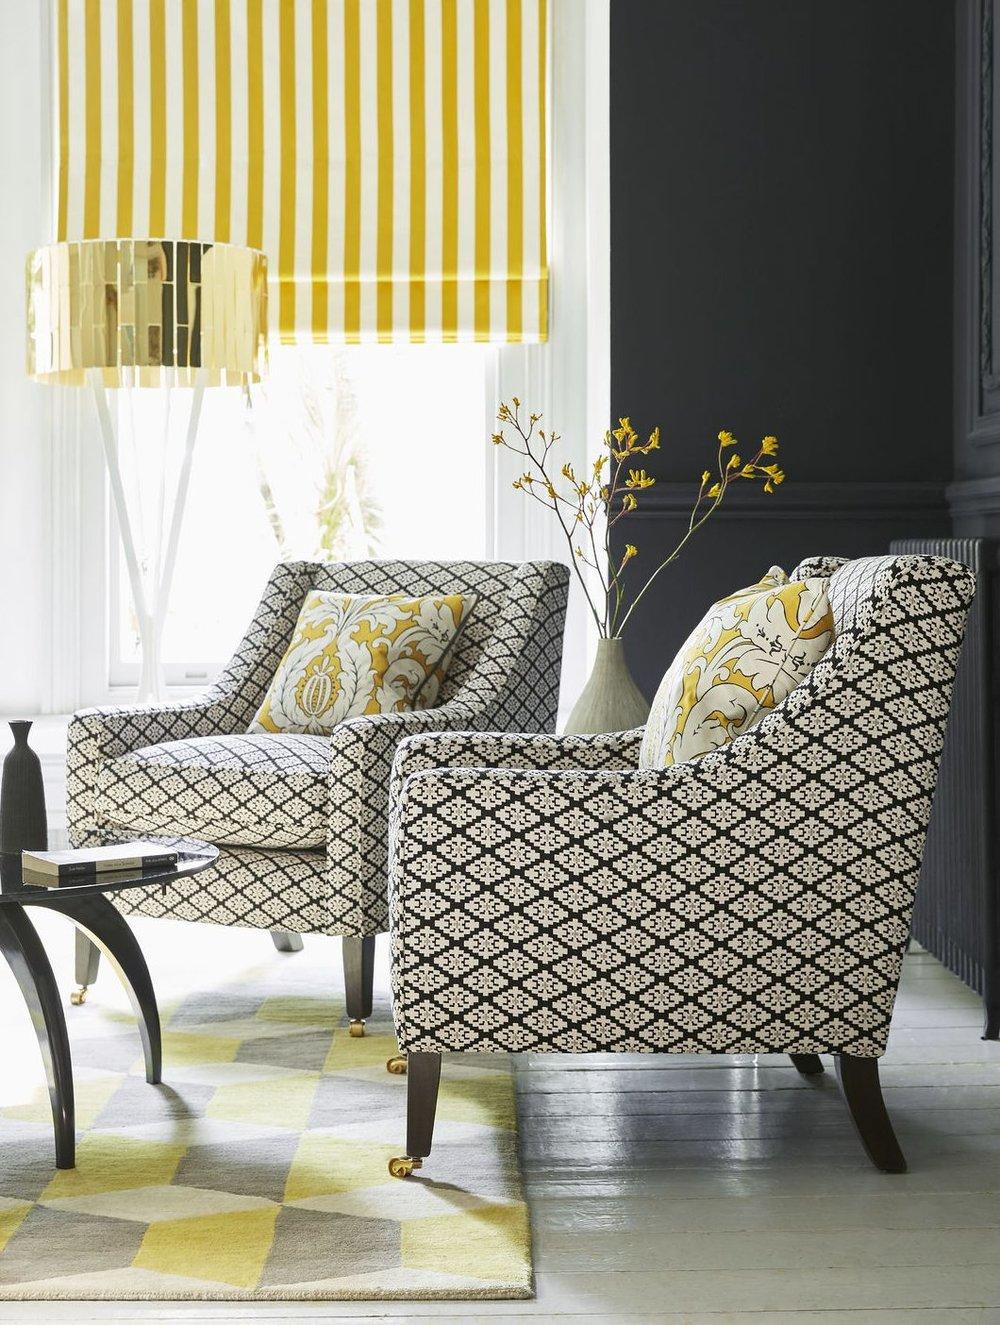 Colour Schemes & Soft Furnishings